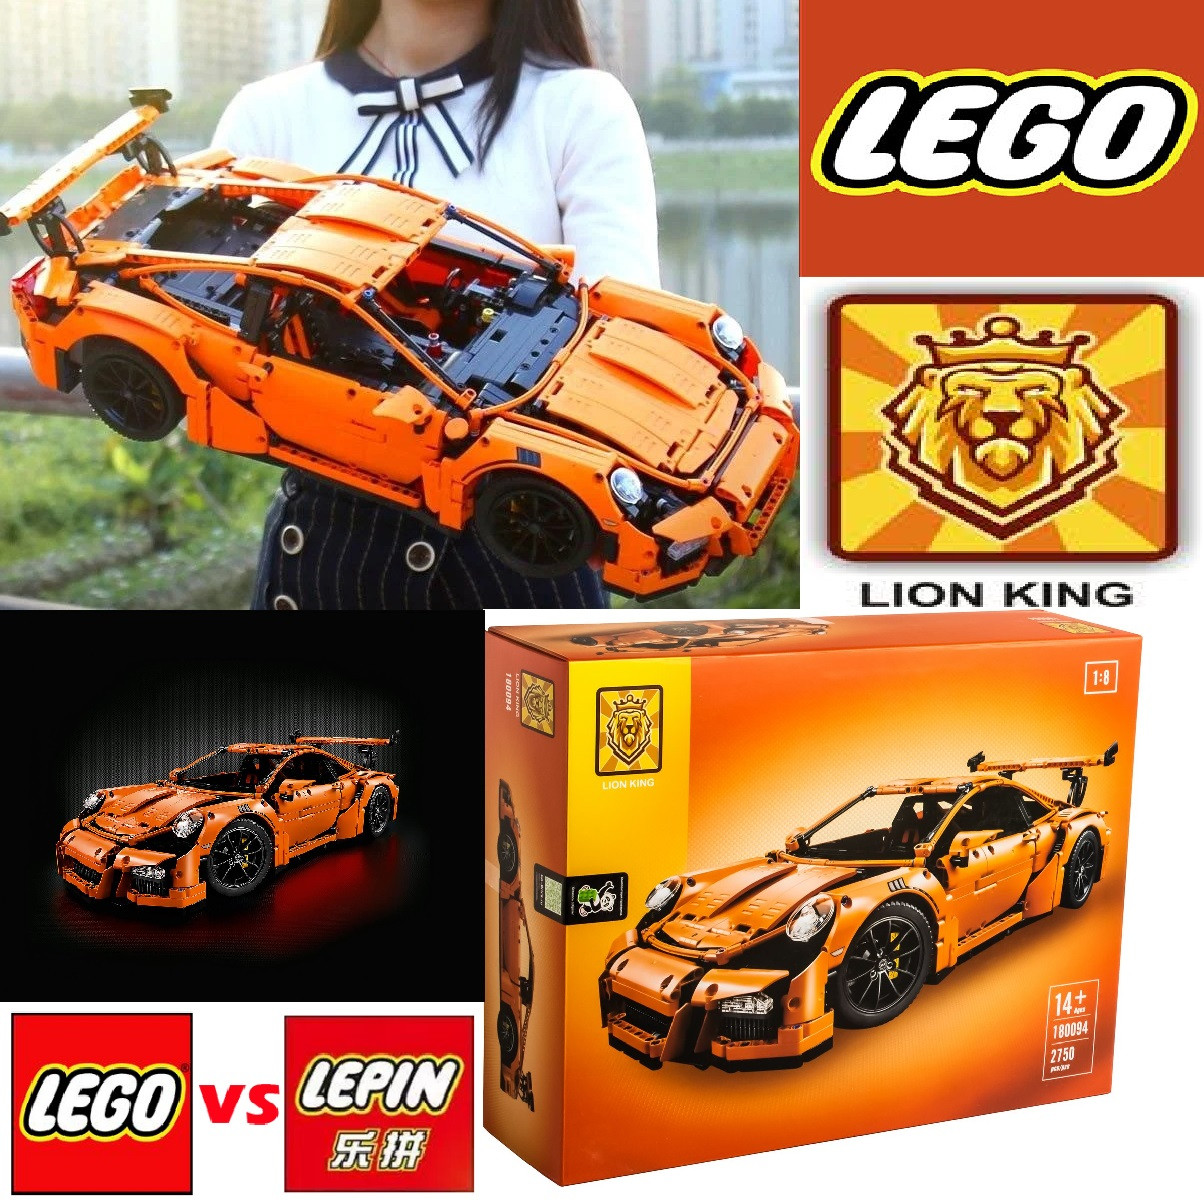 Конструктор Lego (Lepin, Lion King) Porshe 911 GT3 RS. Улучшенная версия. Большой конструктор 2758 деталей.